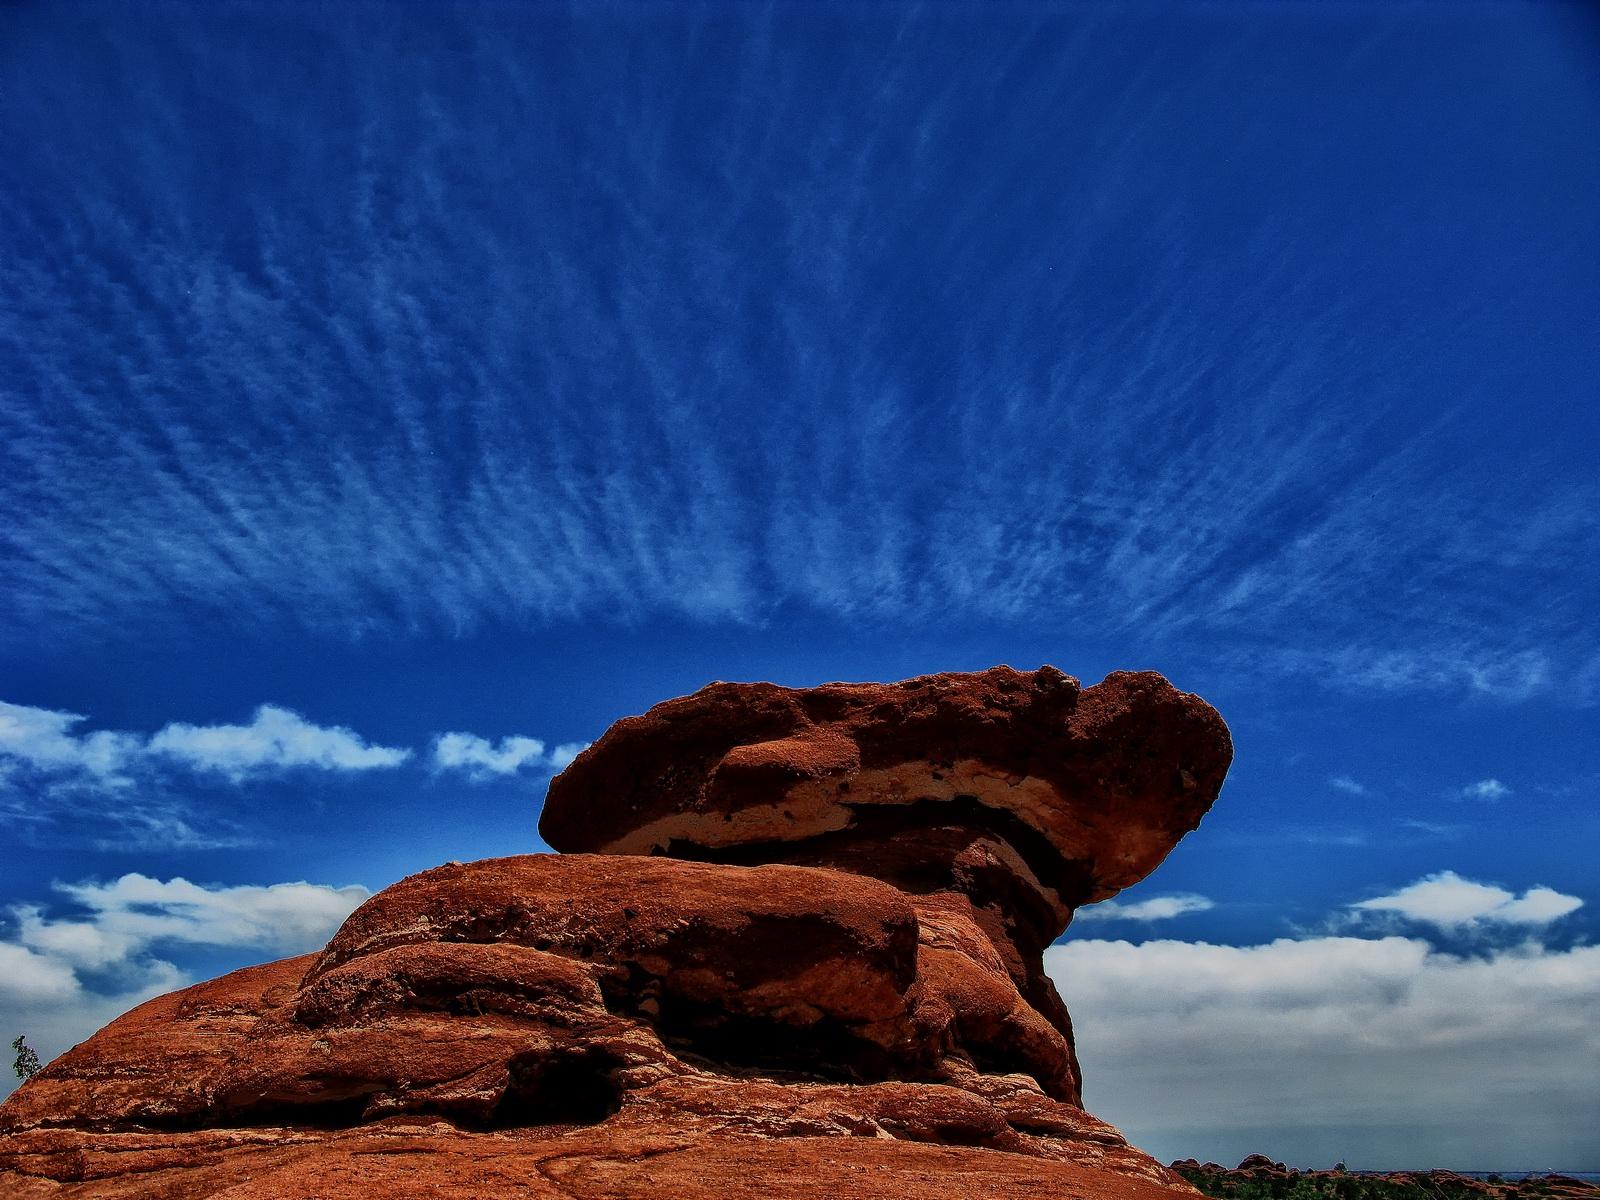 colarado, colarado springs, the scotsman, cloud, photo